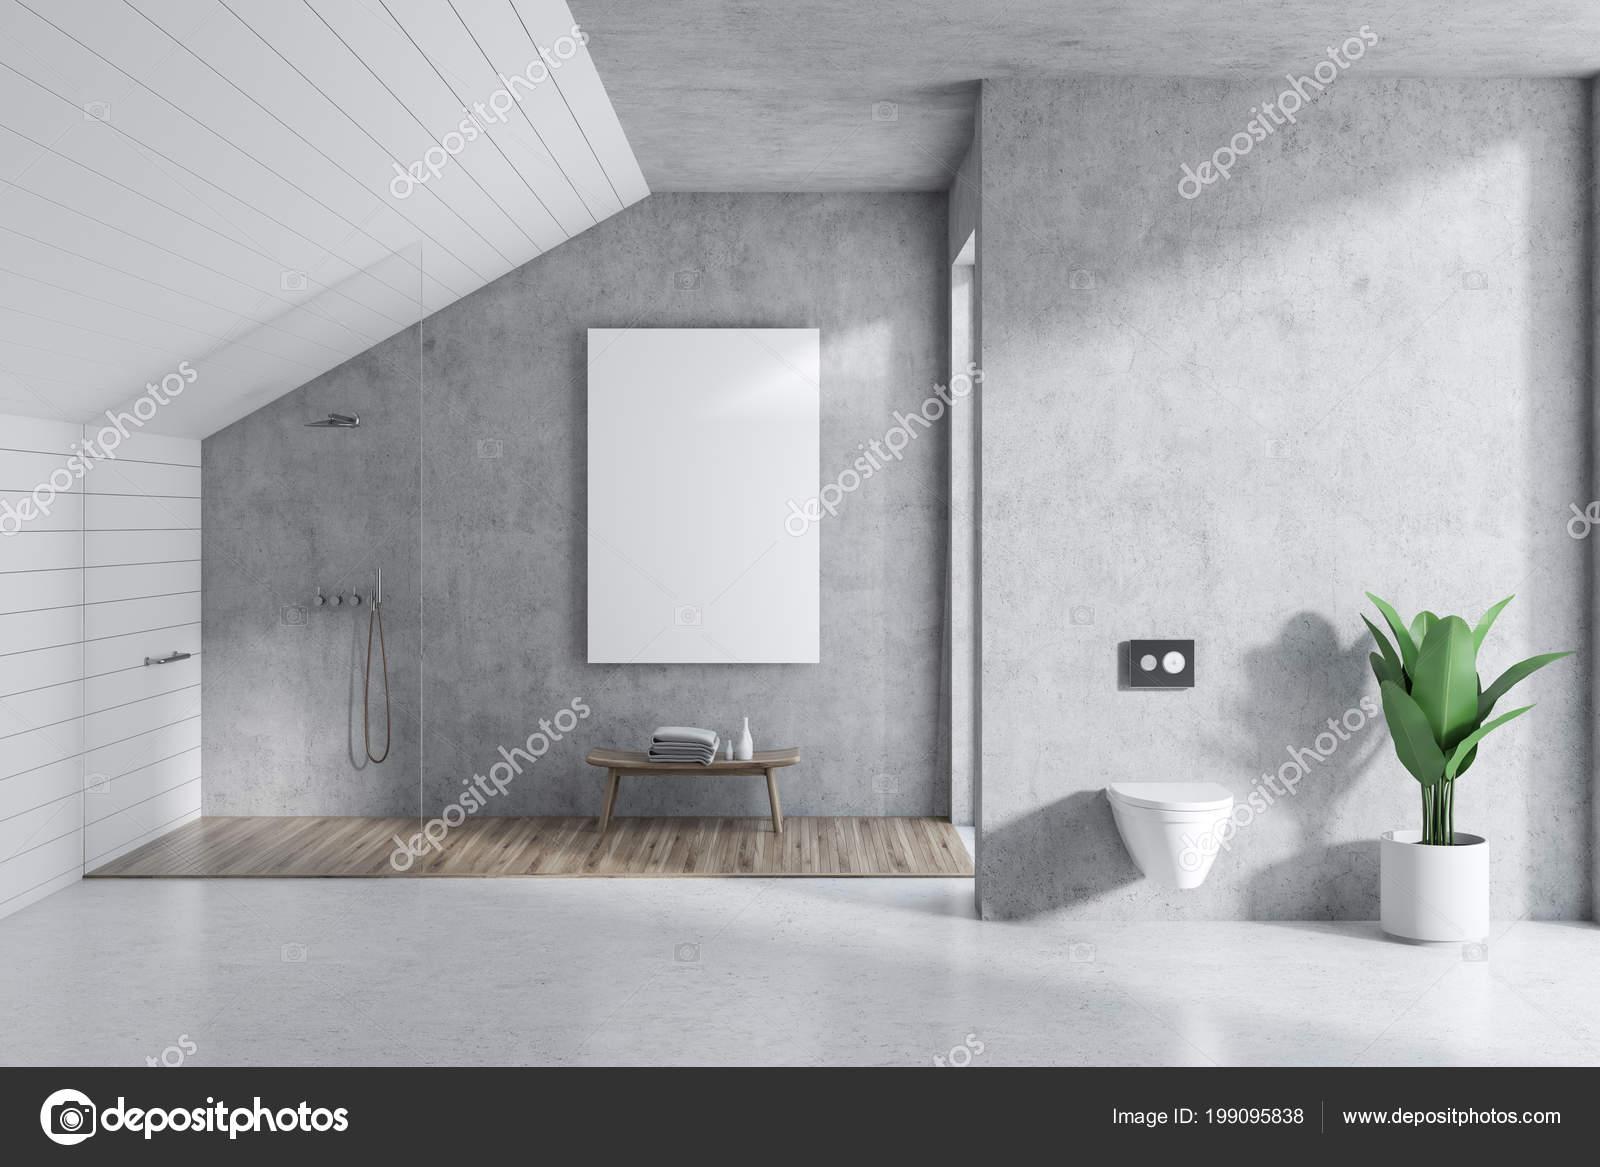 Beau Attic Bathroom Interior Concrete White Walls Concrete Floor Shower Stall U2014  Stock Photo